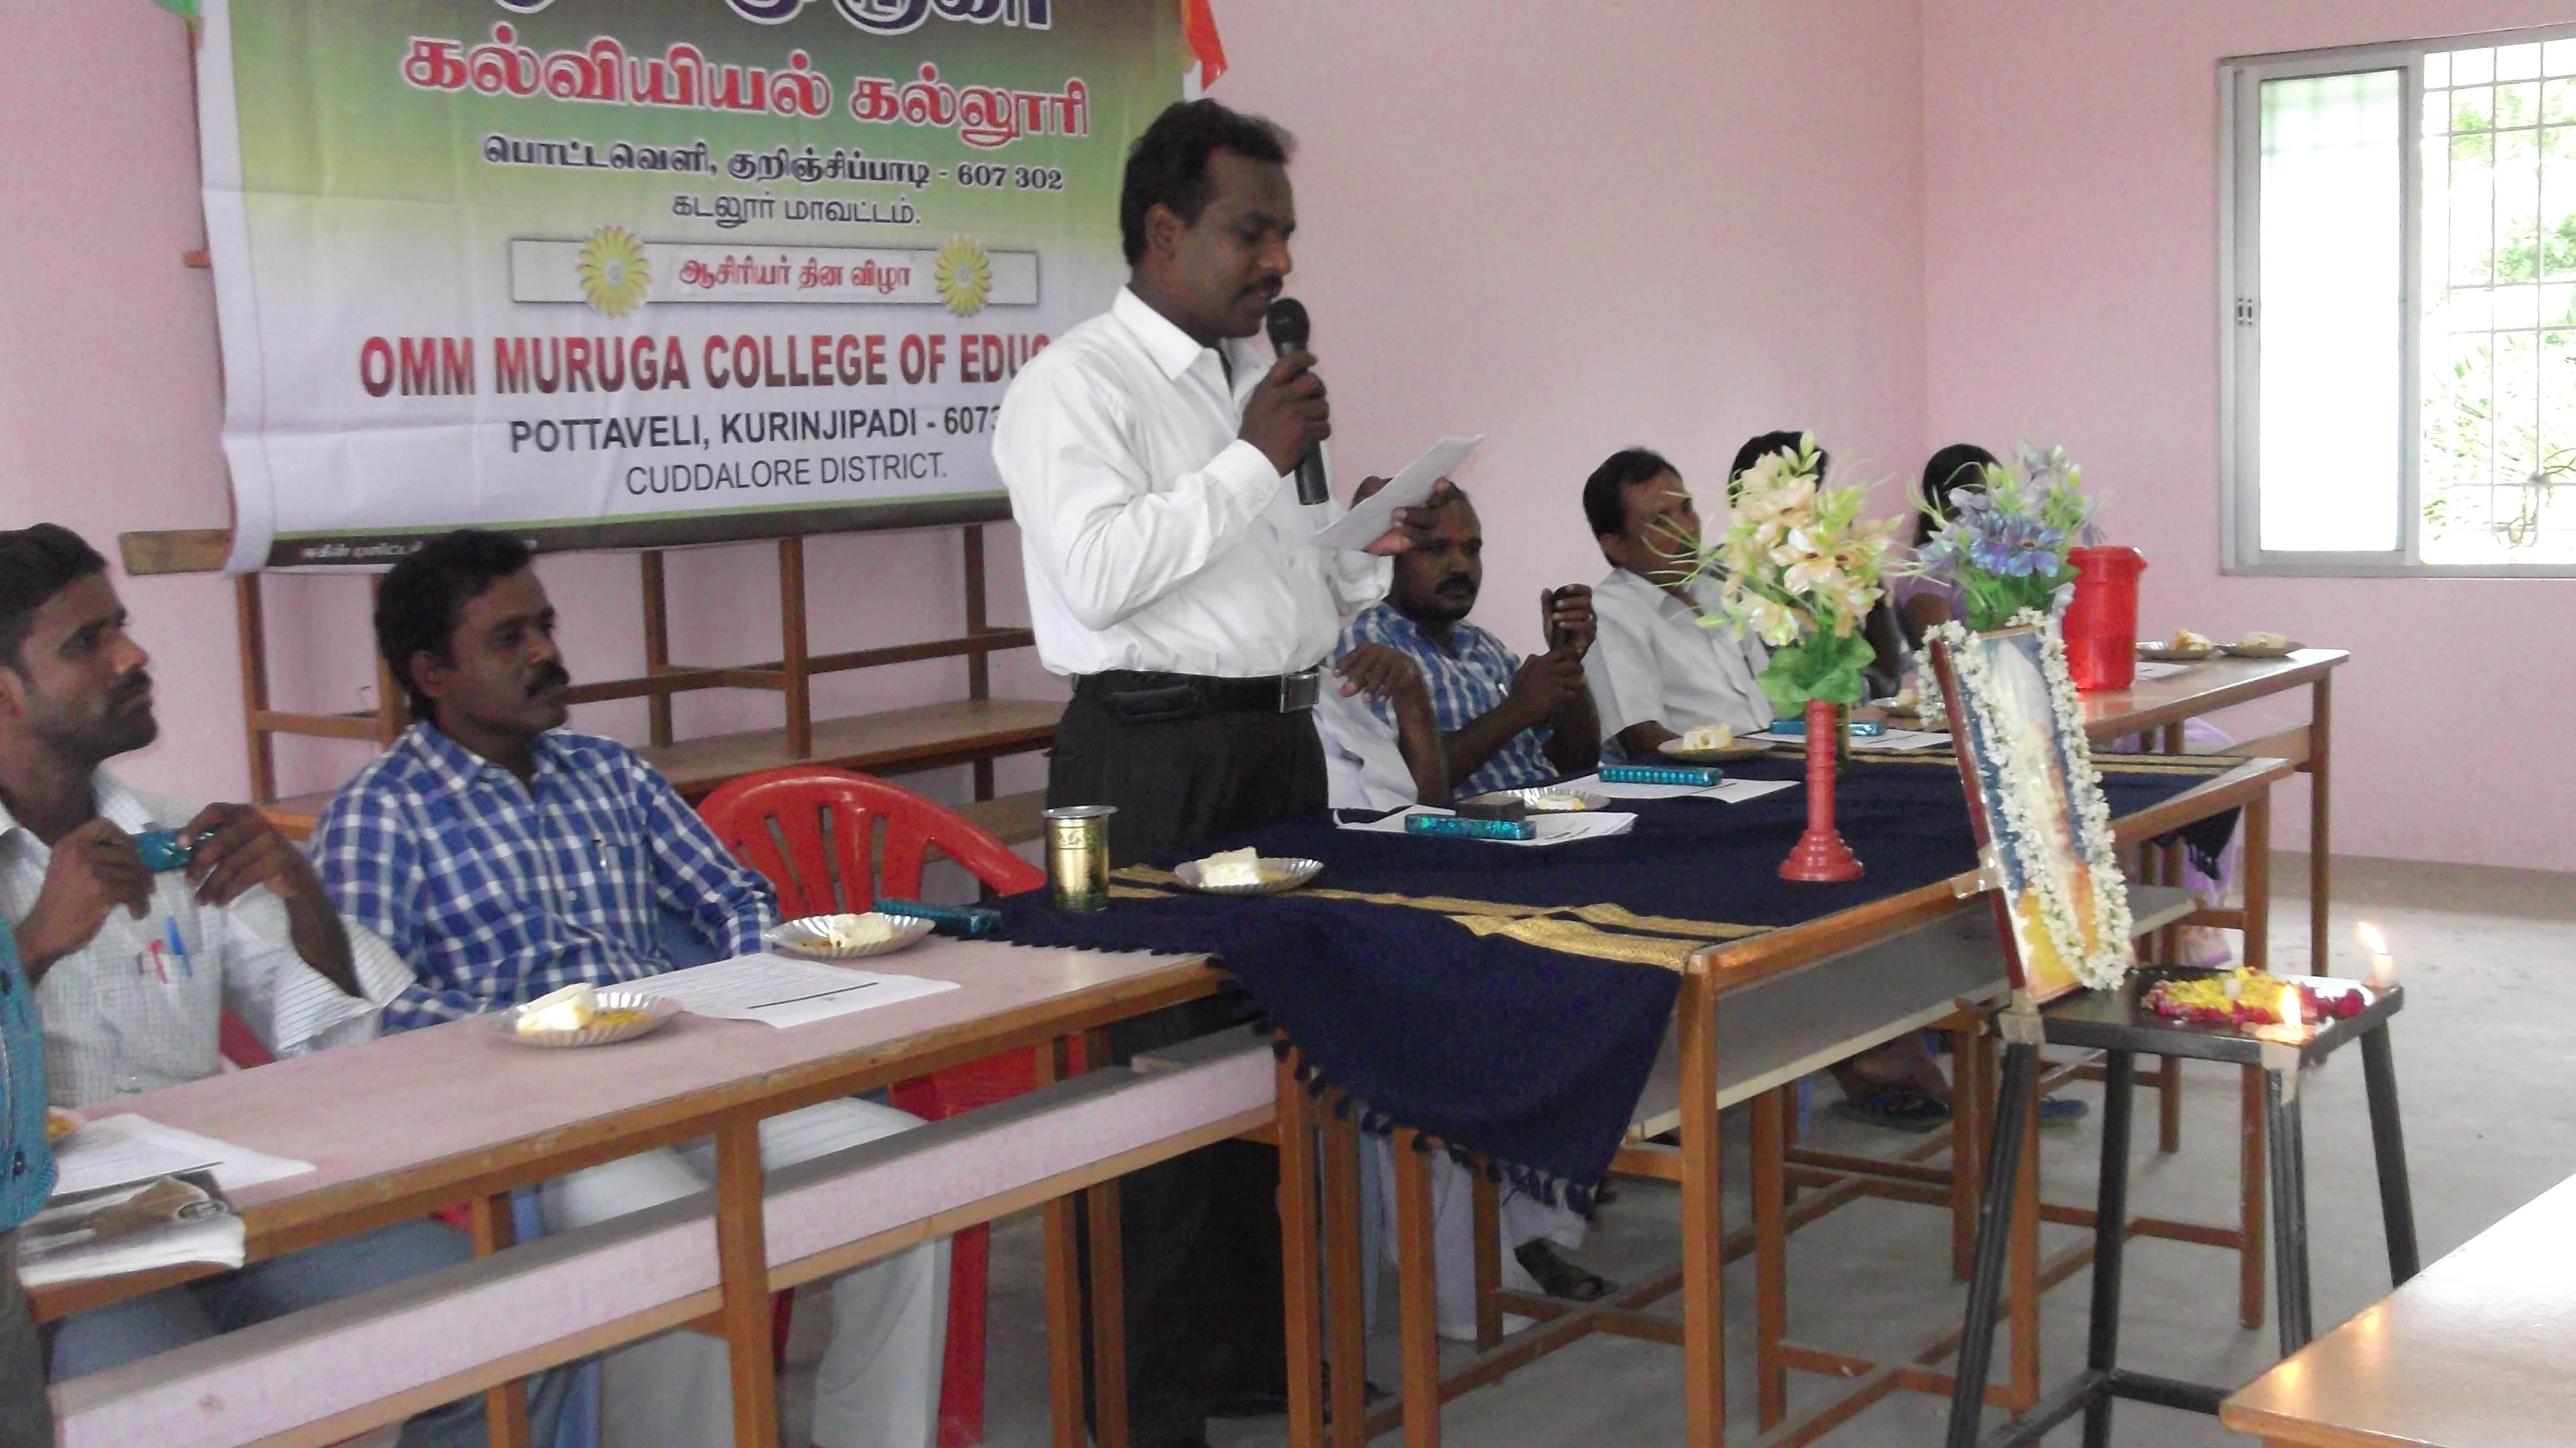 Omm Muruga College of Education, Cuddalore